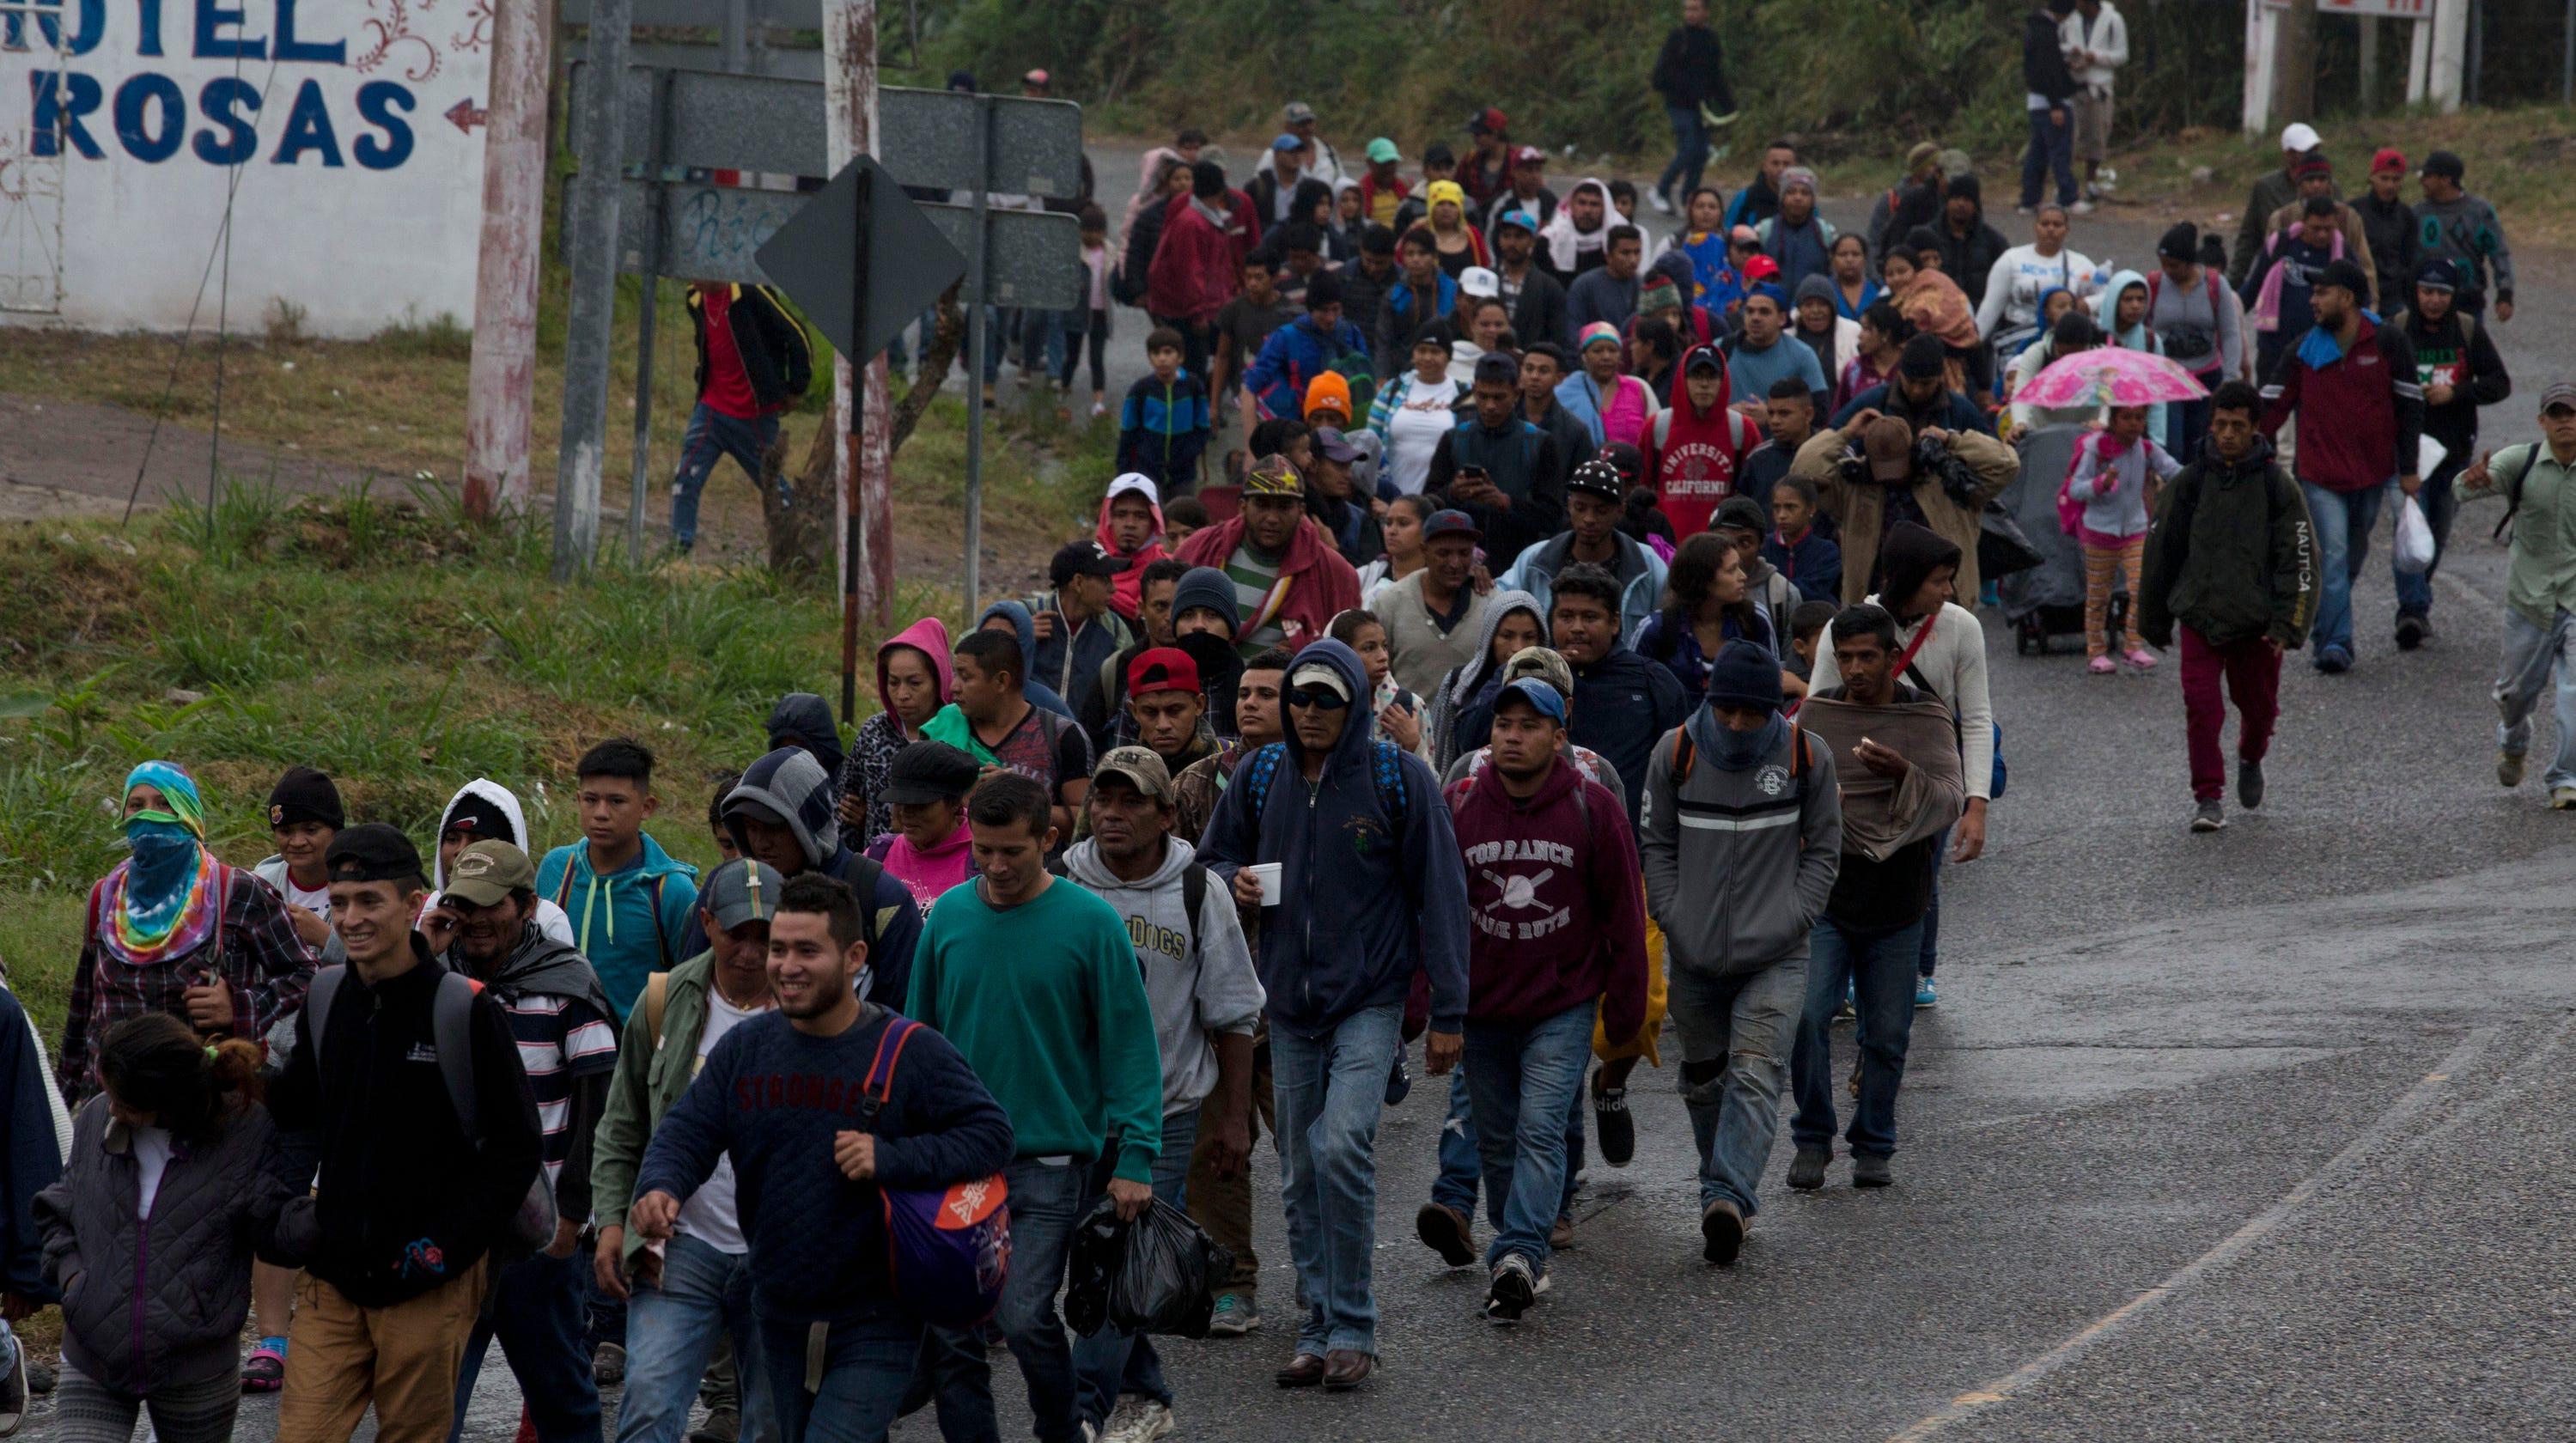 Border sheriffs: Trump's border wall 'a soundbite, not a cogent public policy position'